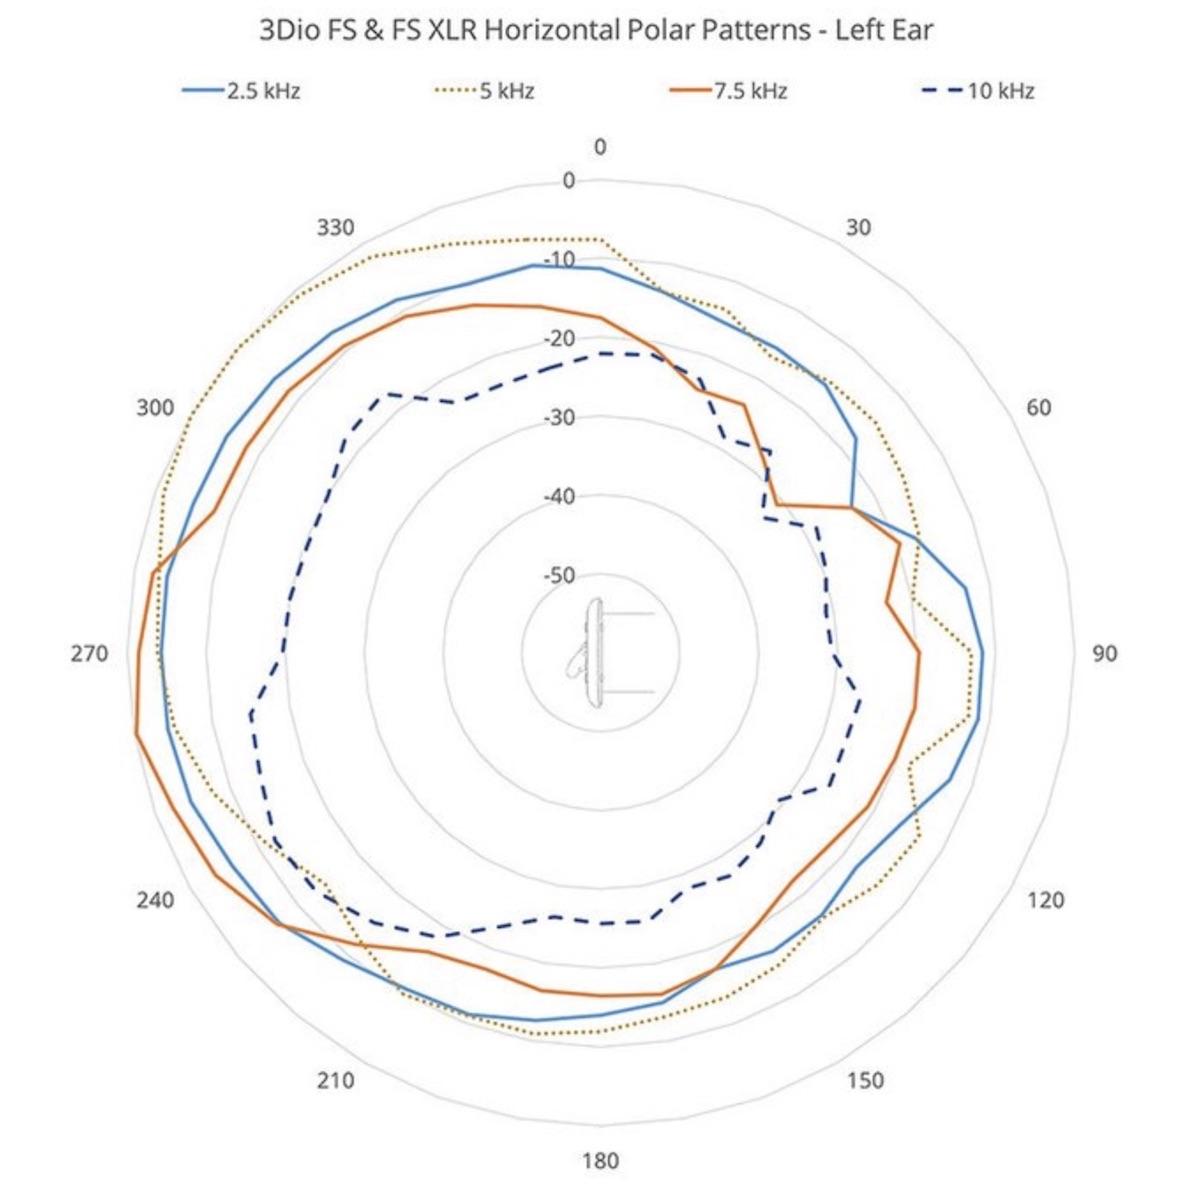 3DIO FS & FSXLR Microphone Horizontal Polar pattern left ear